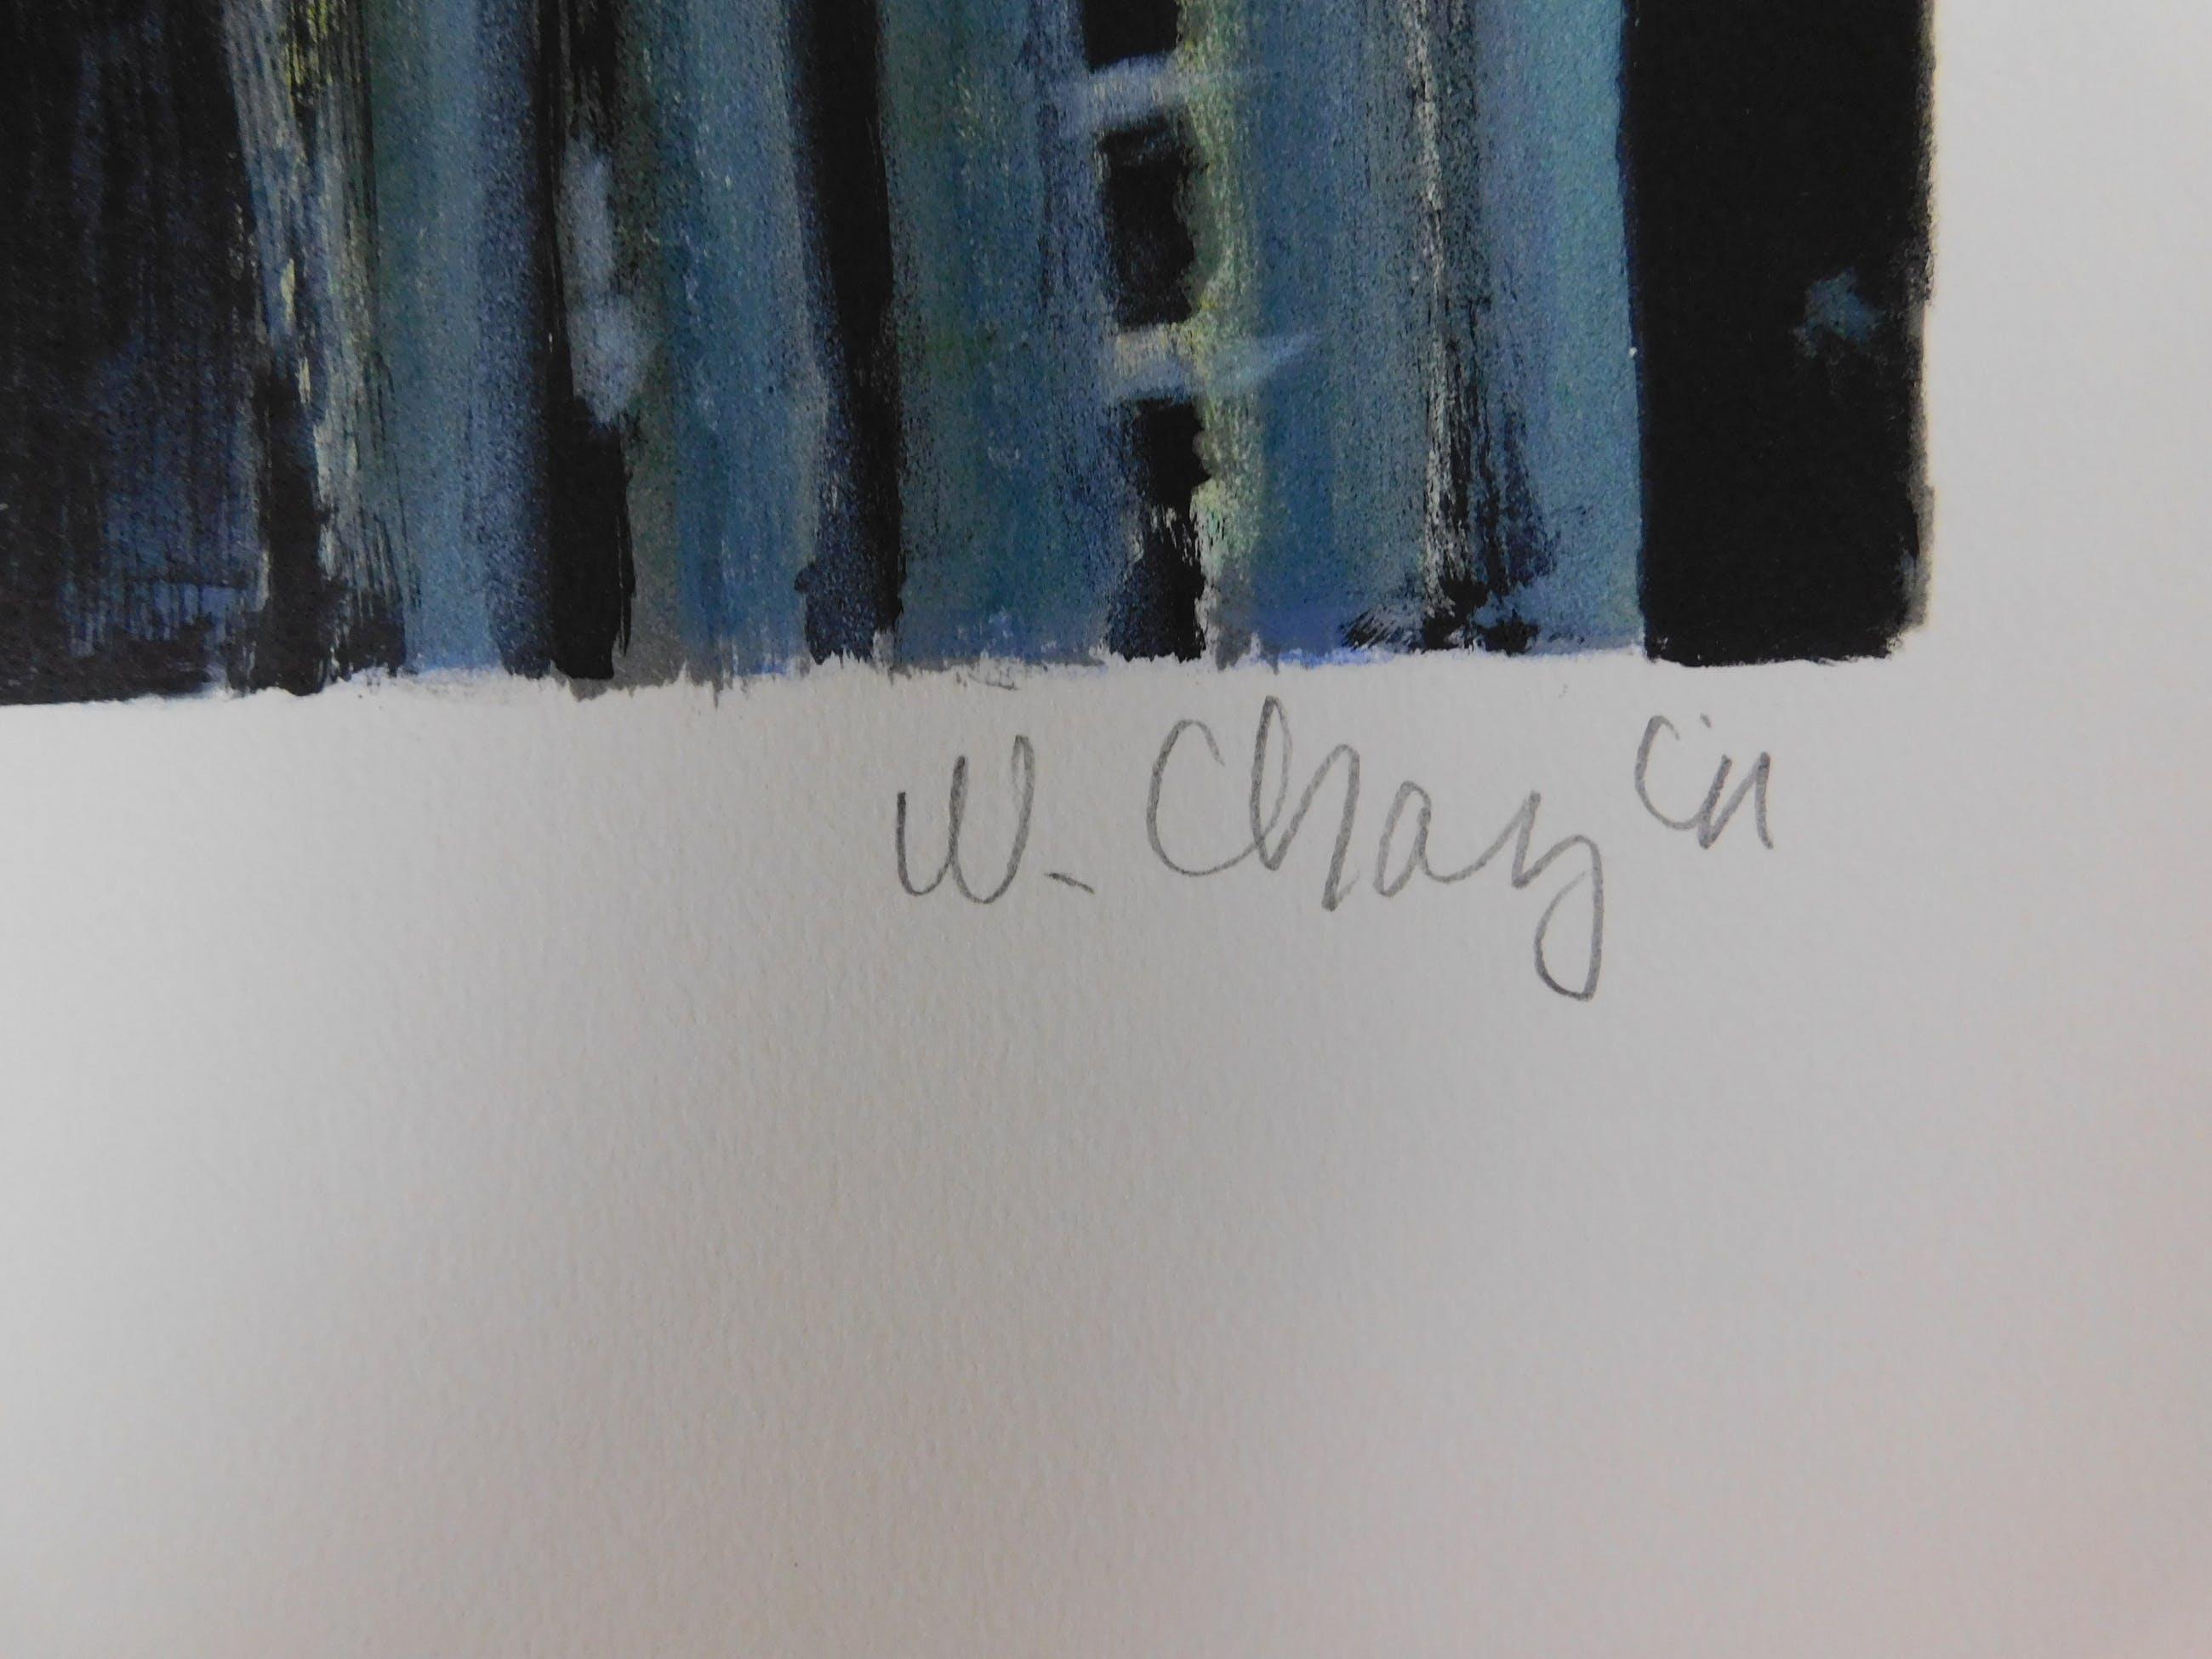 Wendy Chazin - Still-life with Candlesticks kopen? Bied vanaf 25!